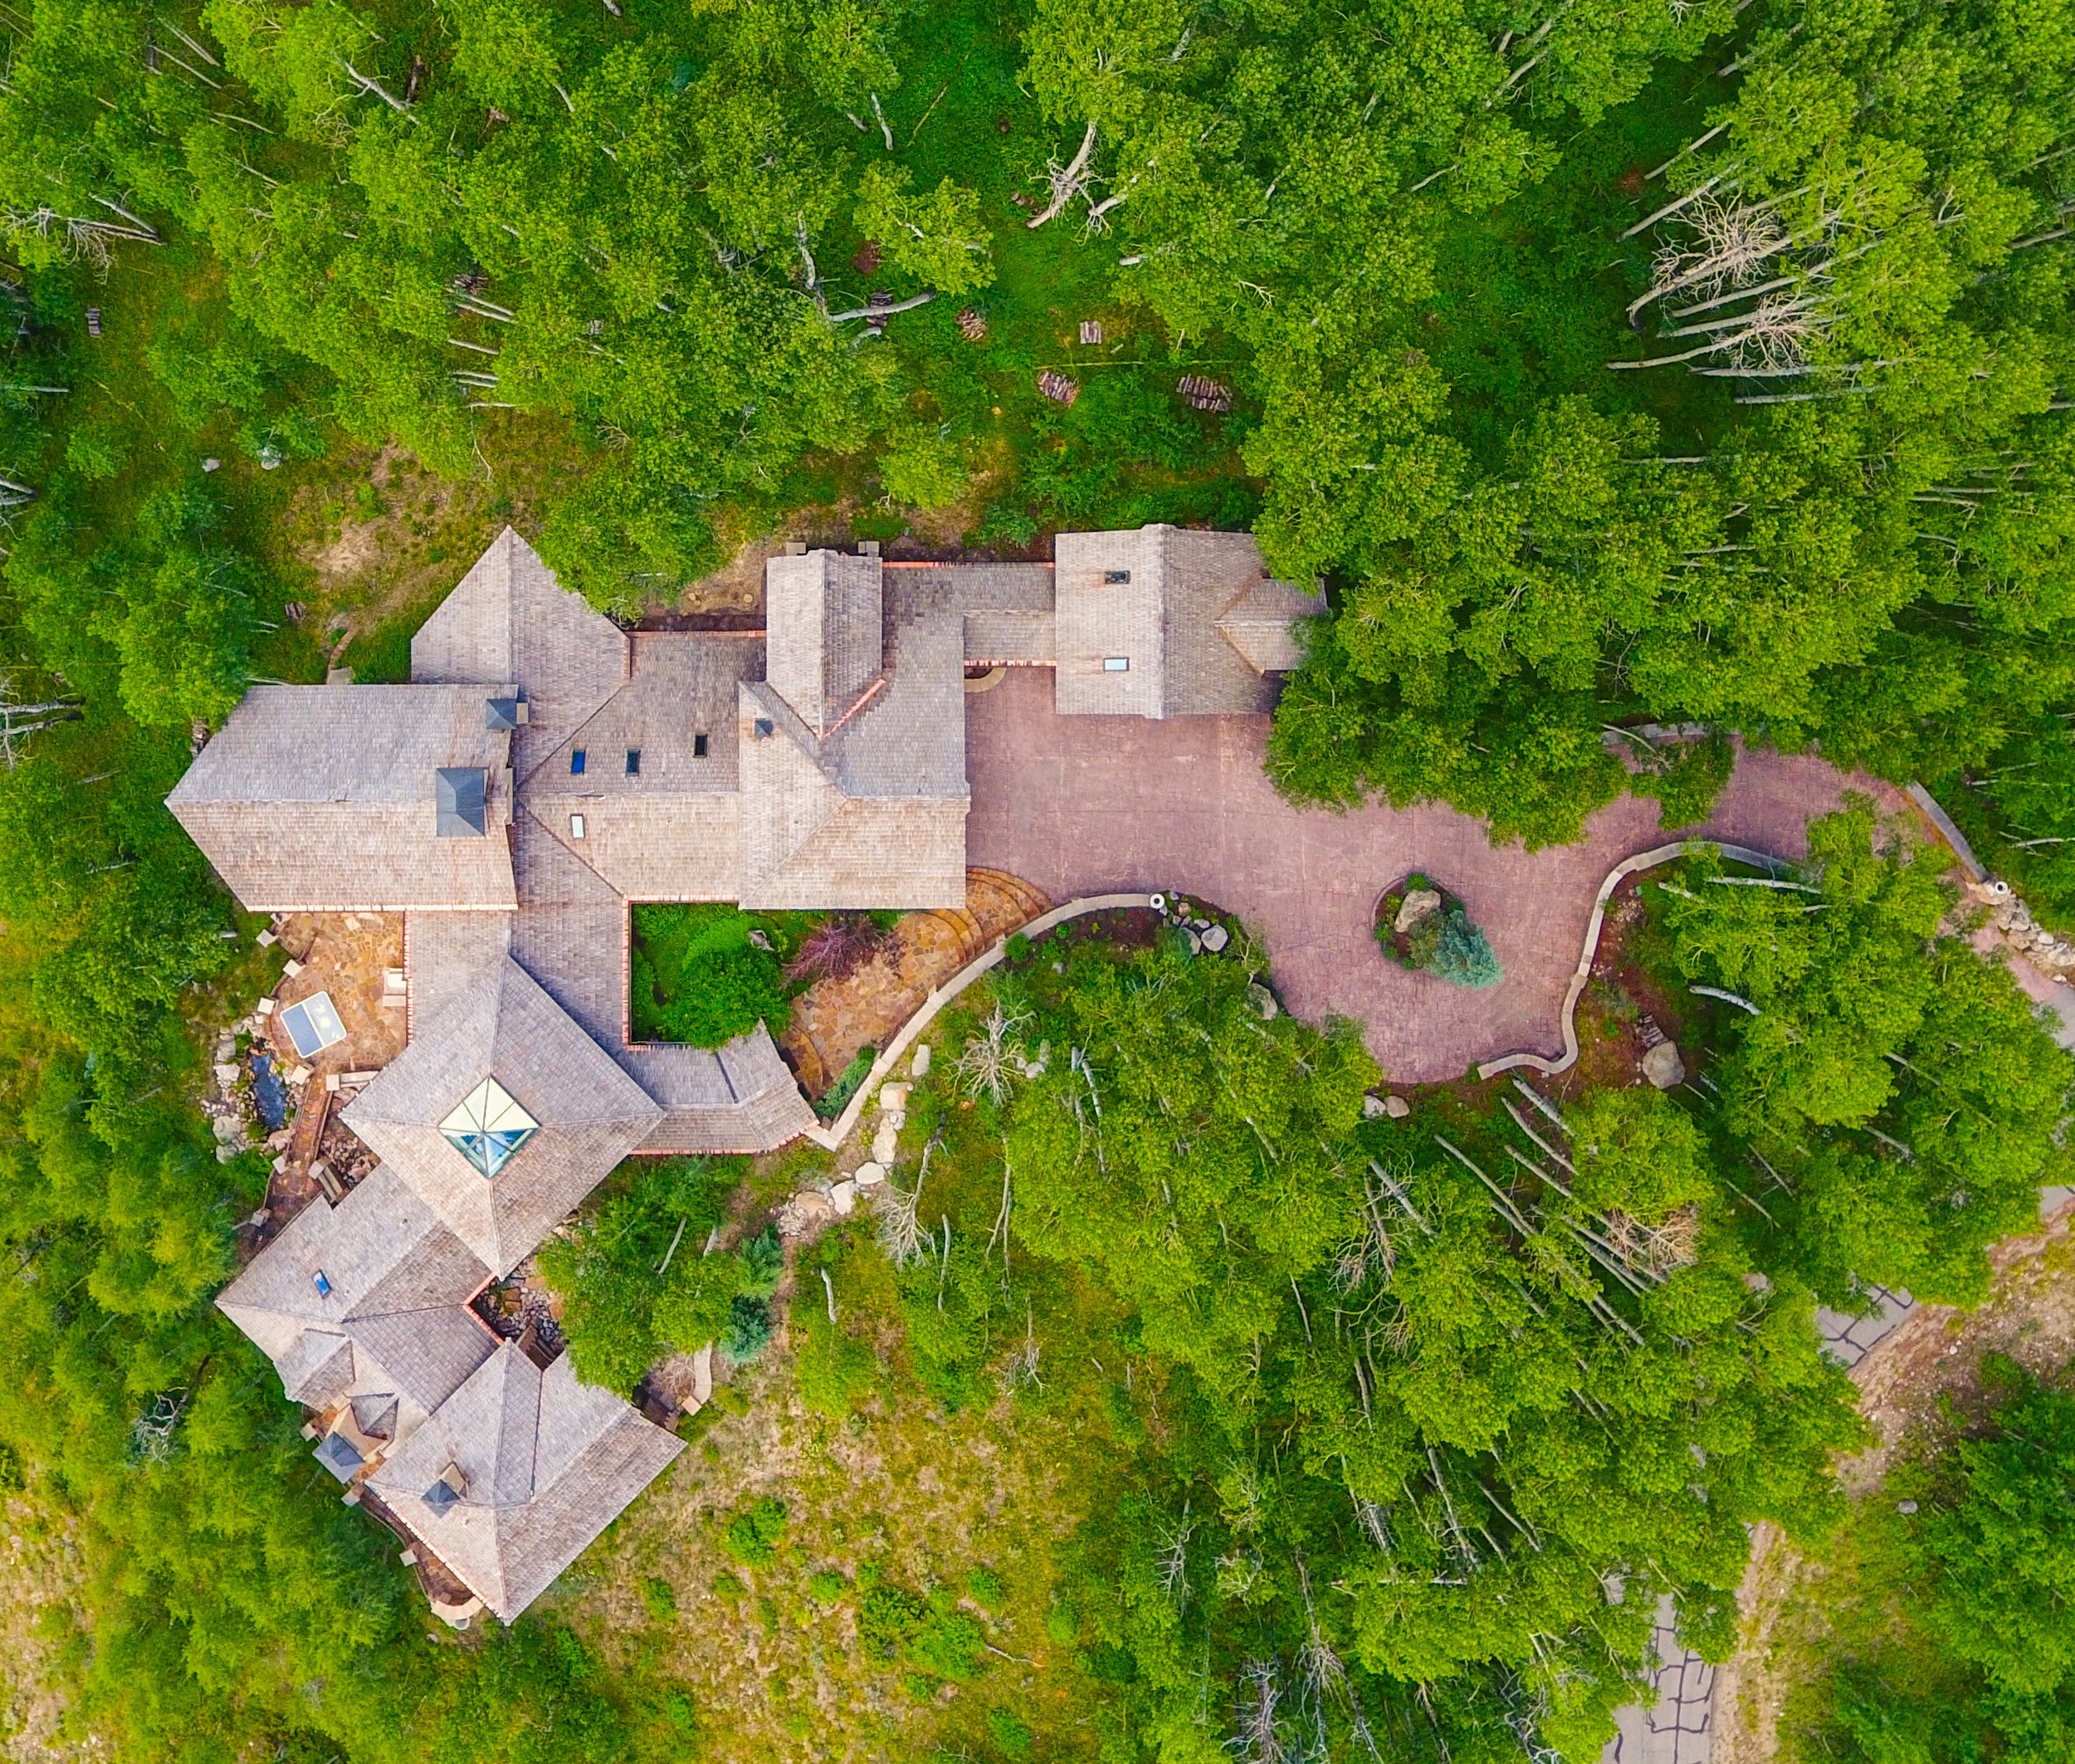 The Castle-11.jpg